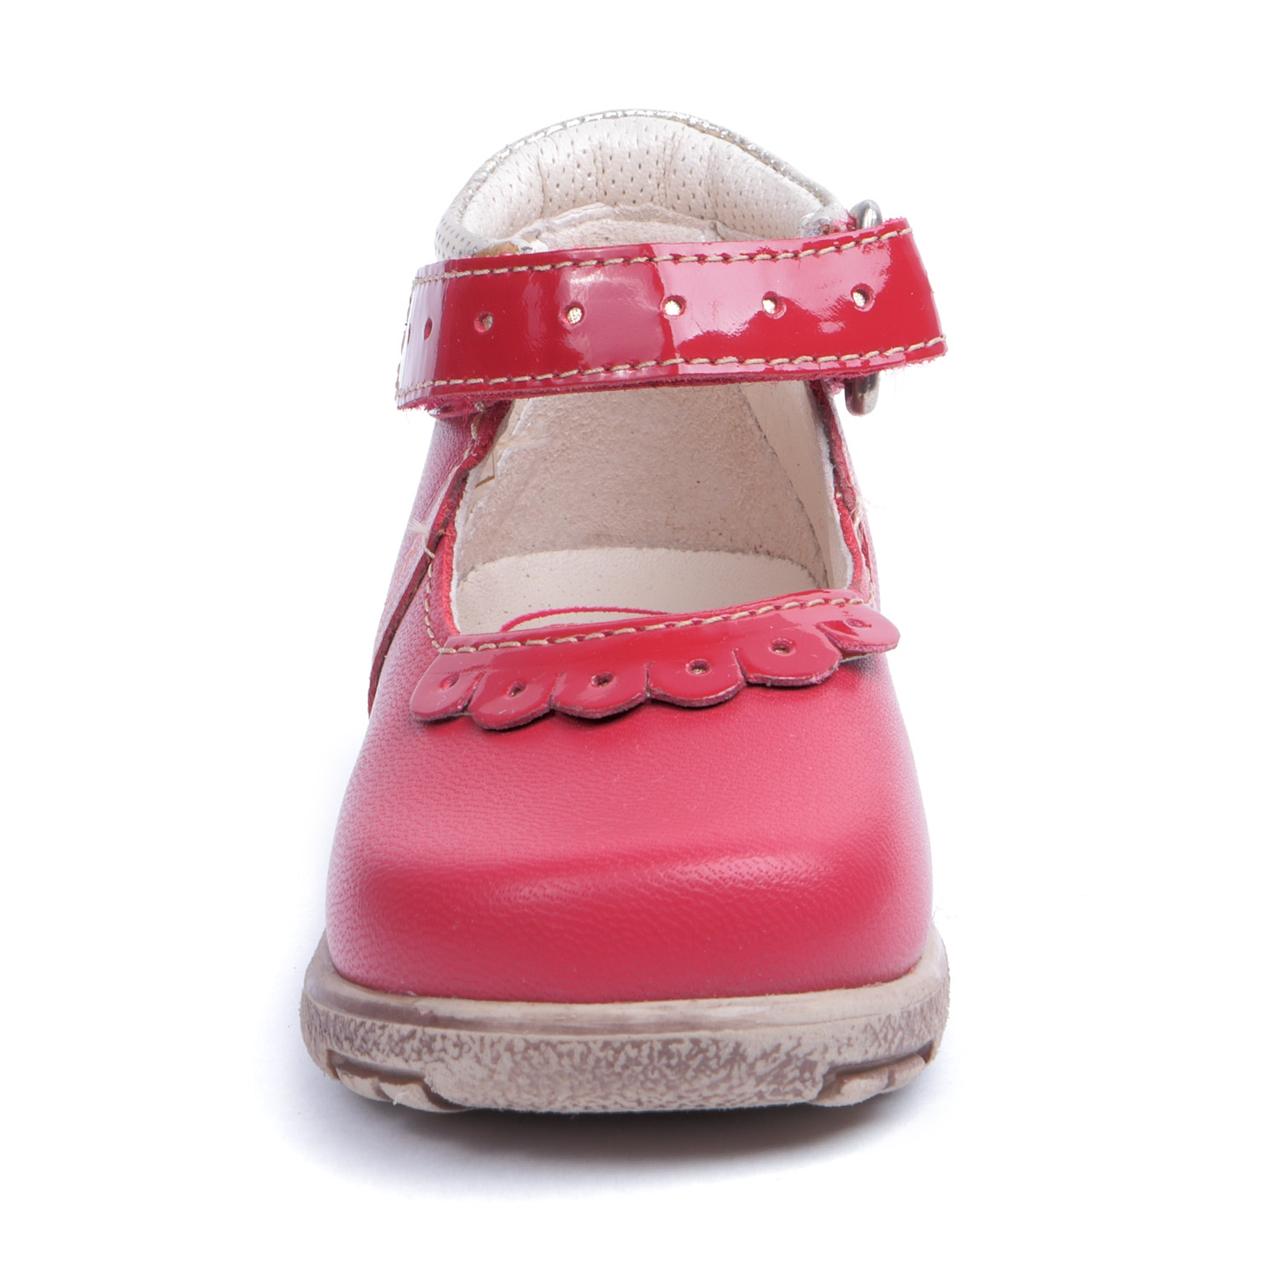 memo shoes memo fiona 3ha infant toddler